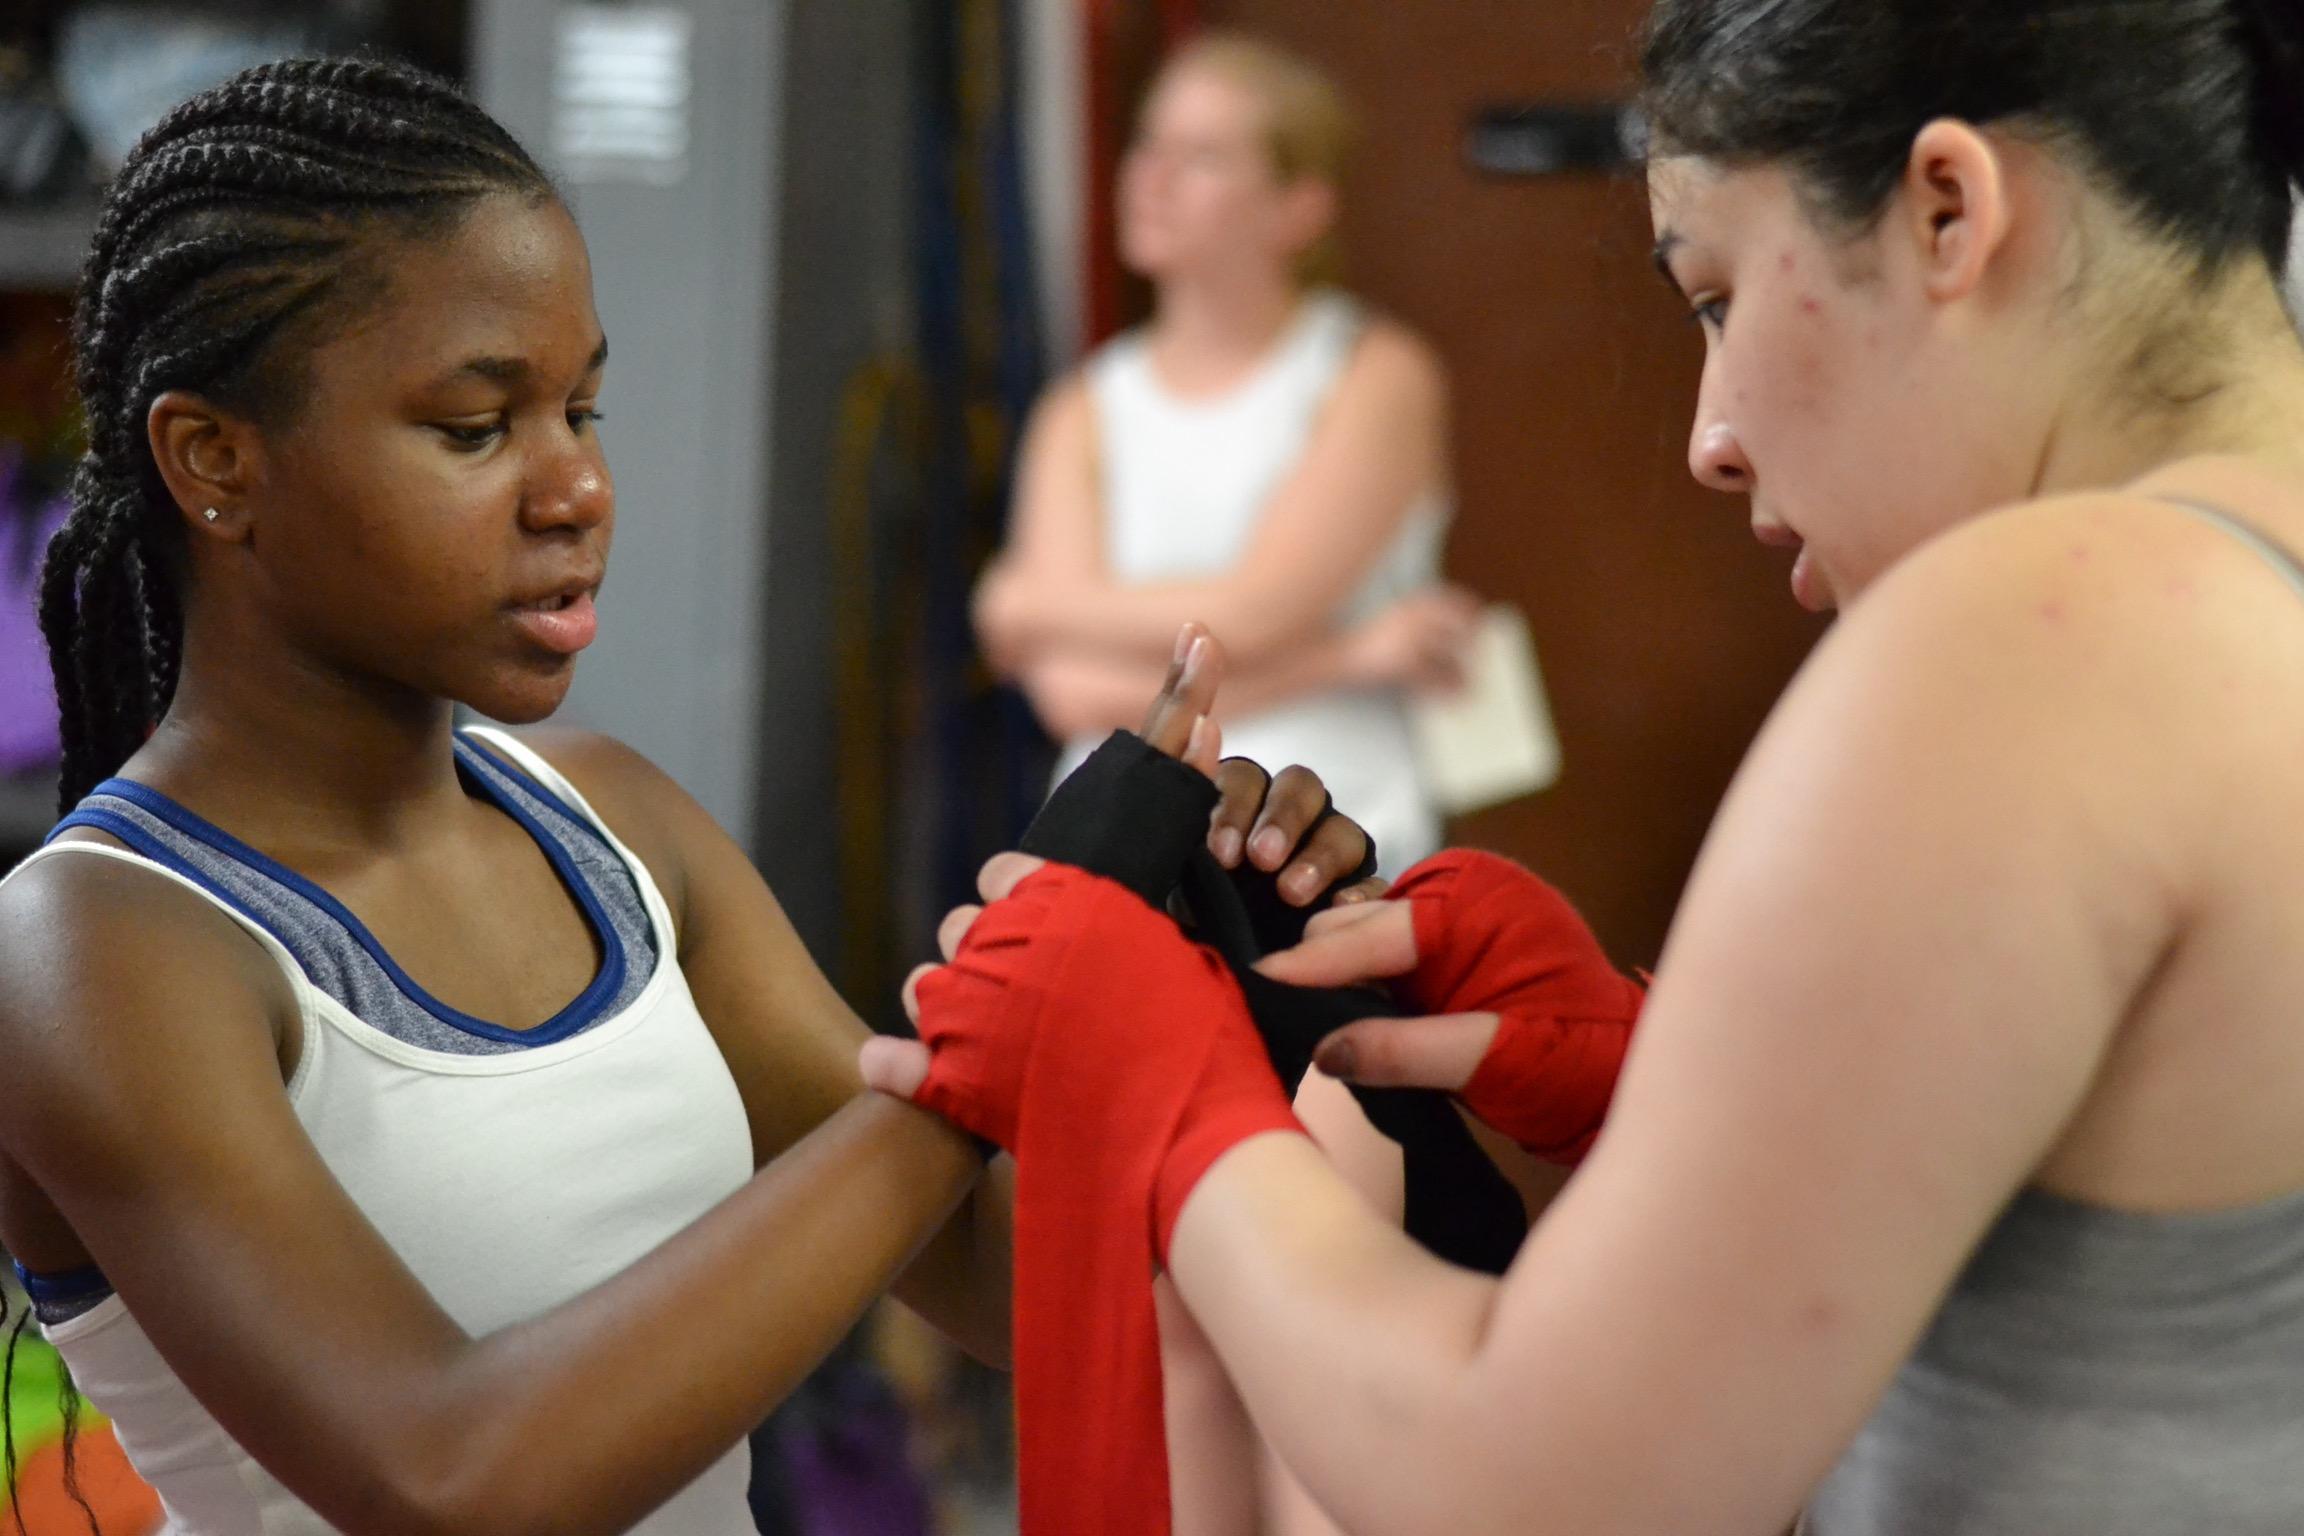 Empowering Girls Through The Sport Of Boxing Women's World of Boxing, NYC + PowerPlayNYC #ssla2016 Summer Leadership Academy ©women's world of boxing. photo by nebi.